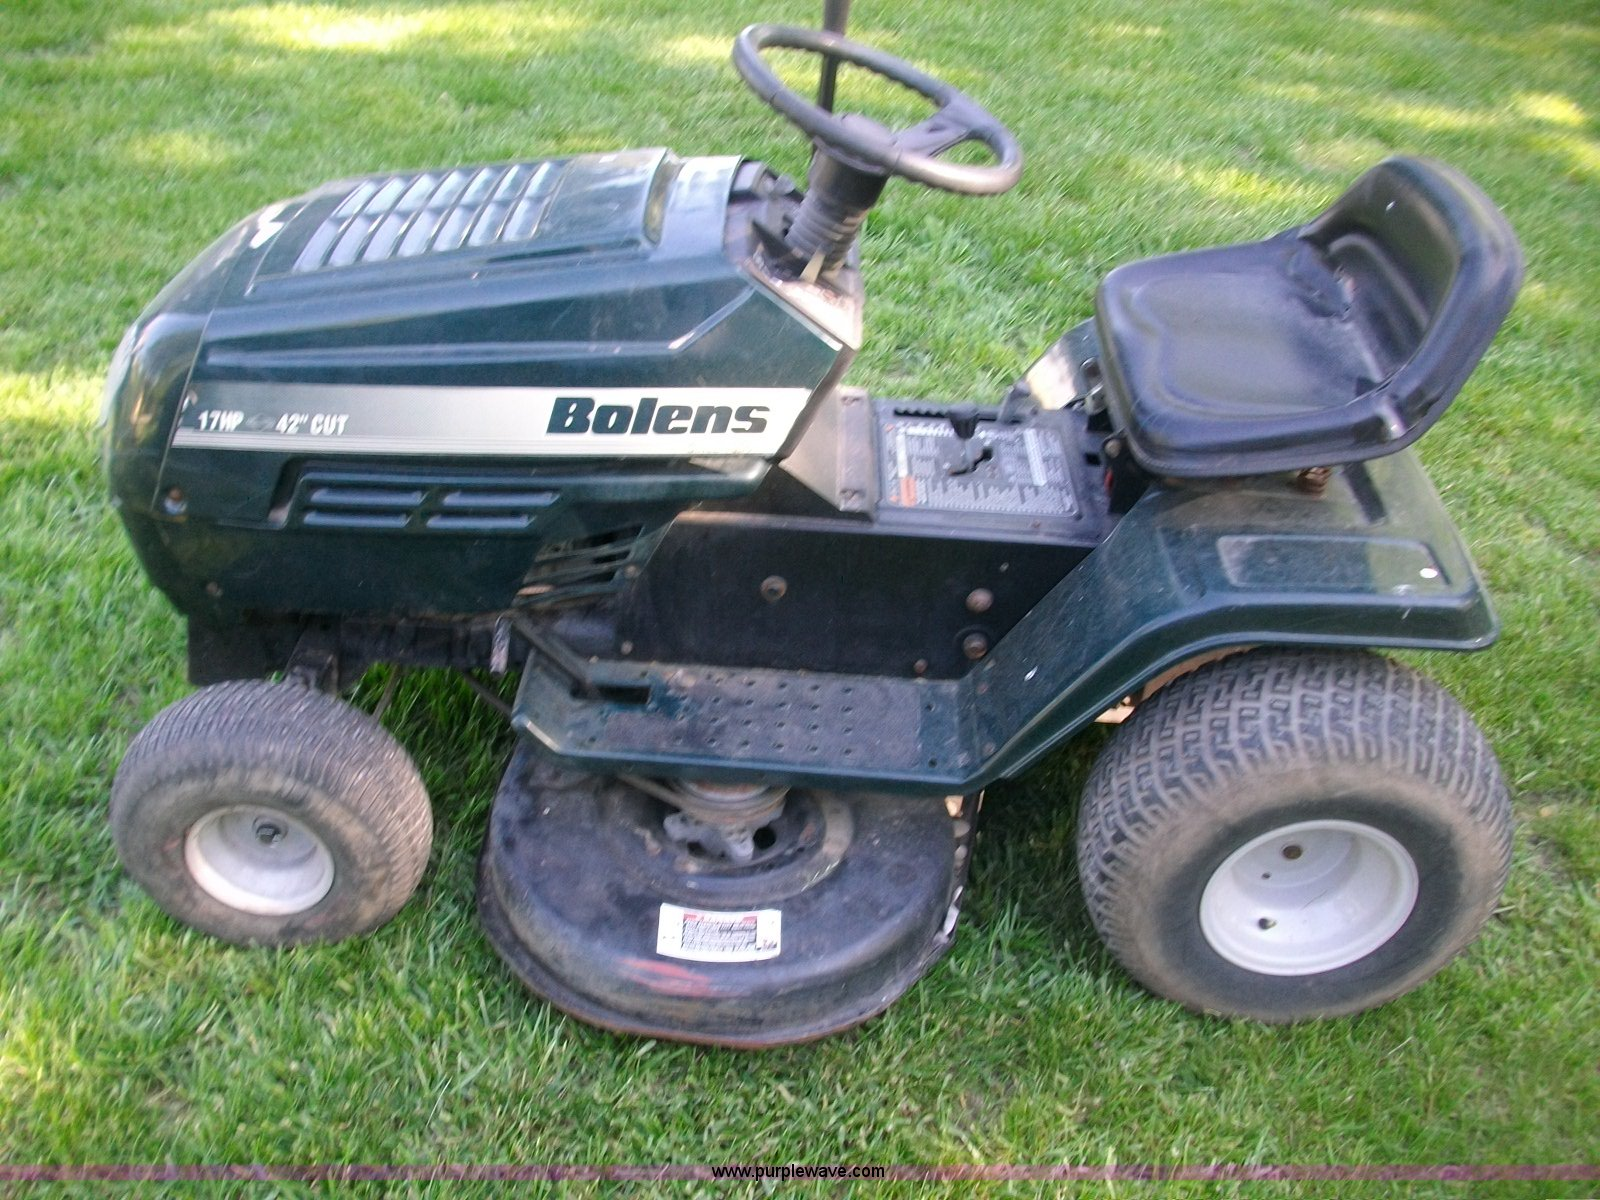 Bolens riding mower | Item 1011 | SOLD! June 1 Midwest Inter